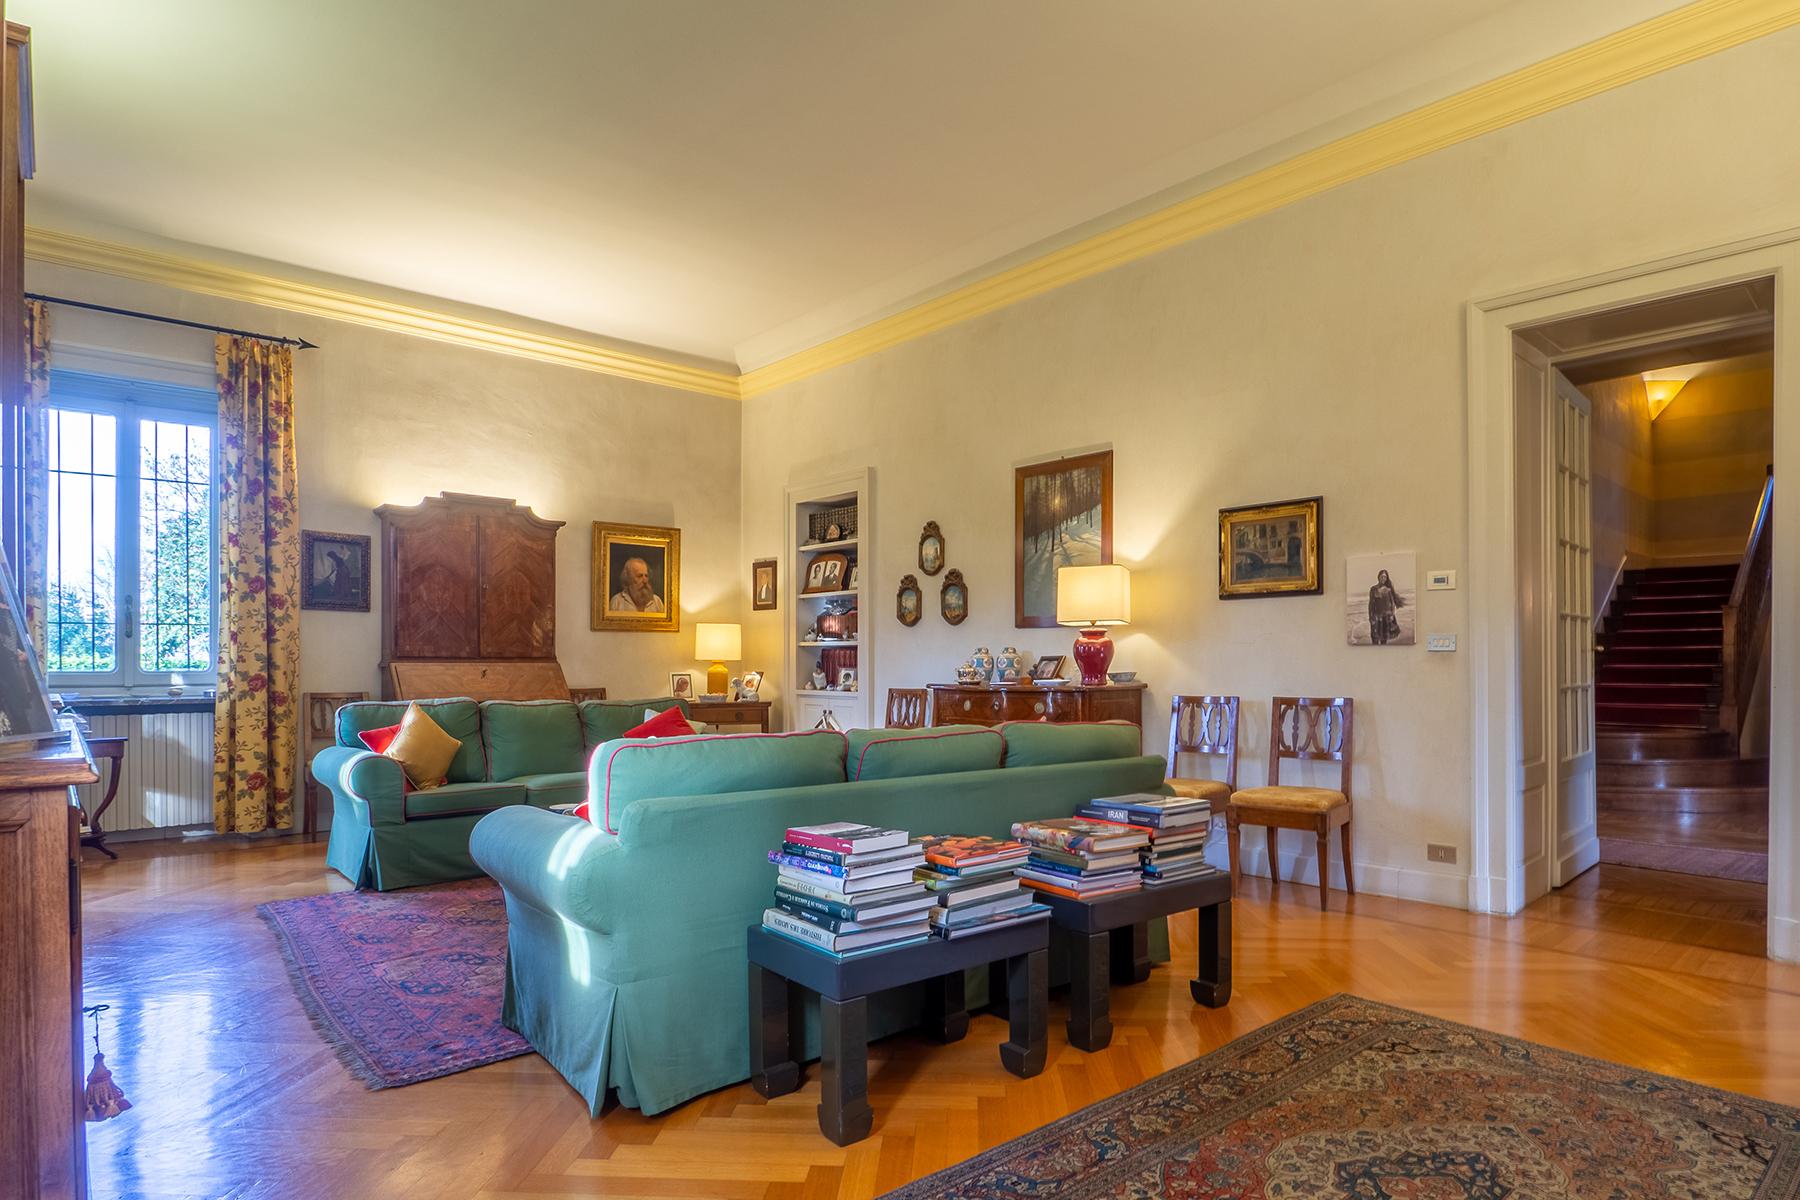 Casa indipendente in Vendita a Torino: 5 locali, 657 mq - Foto 8